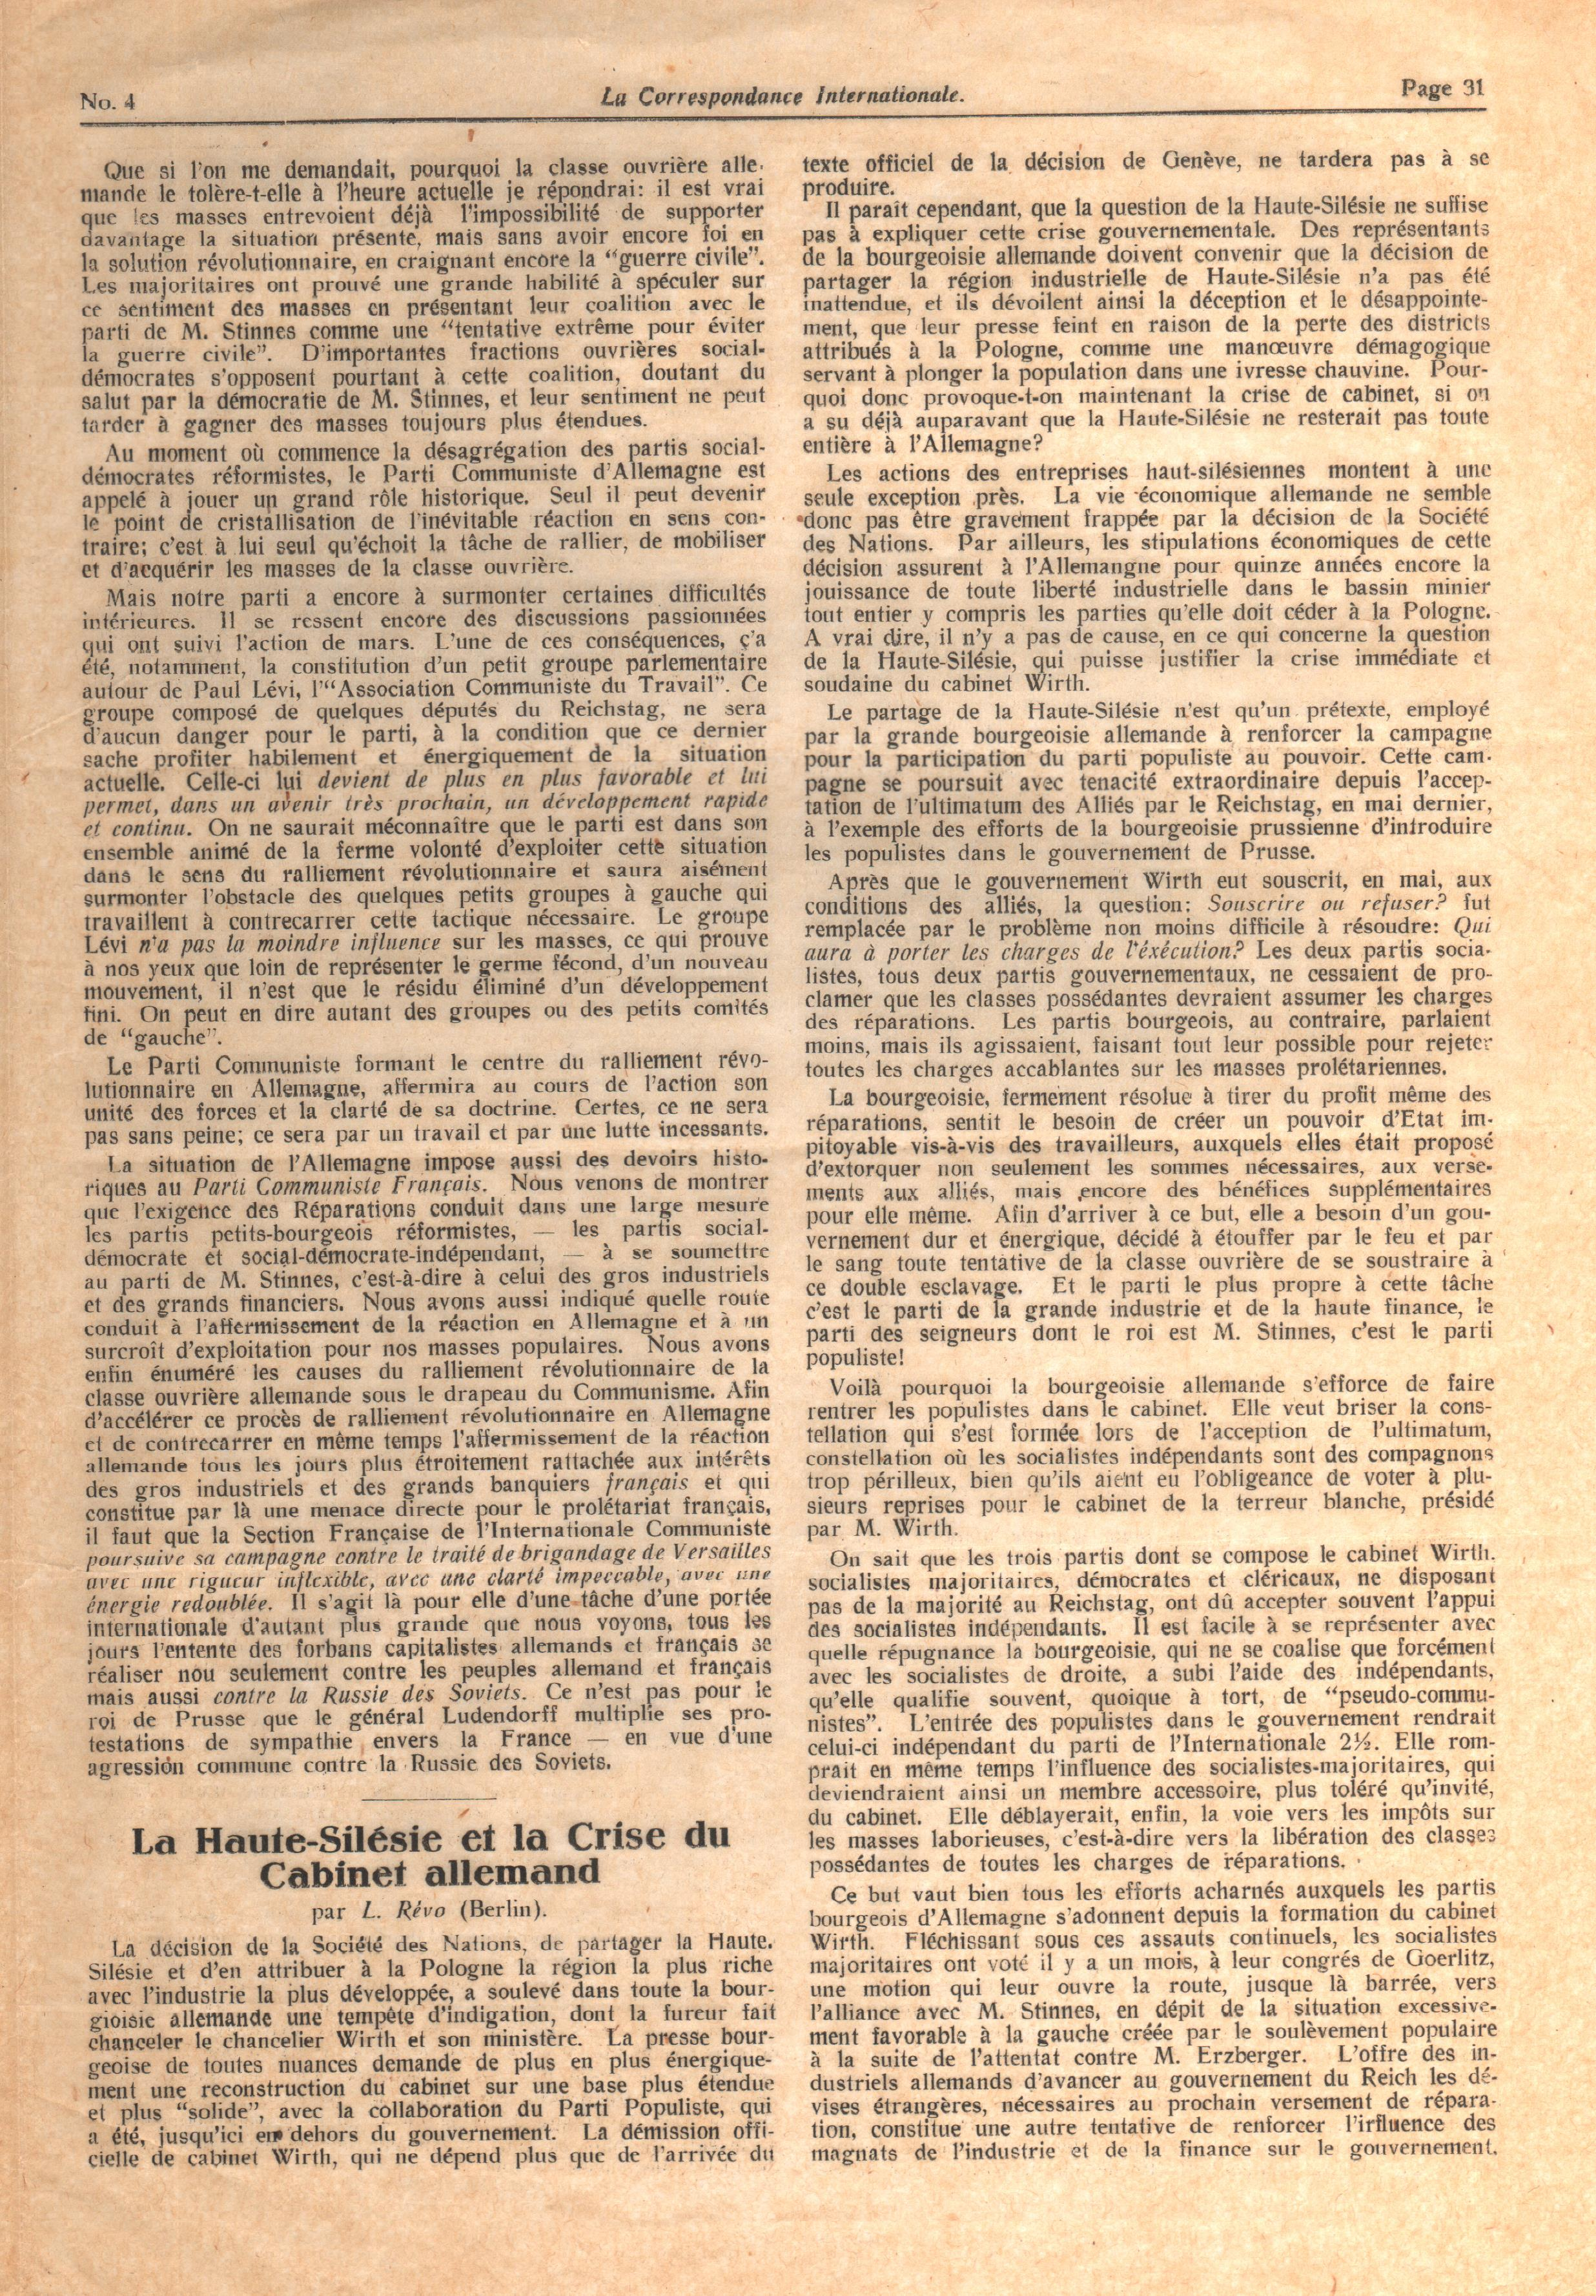 Correspondance Internationale n. 4 - pag. 3